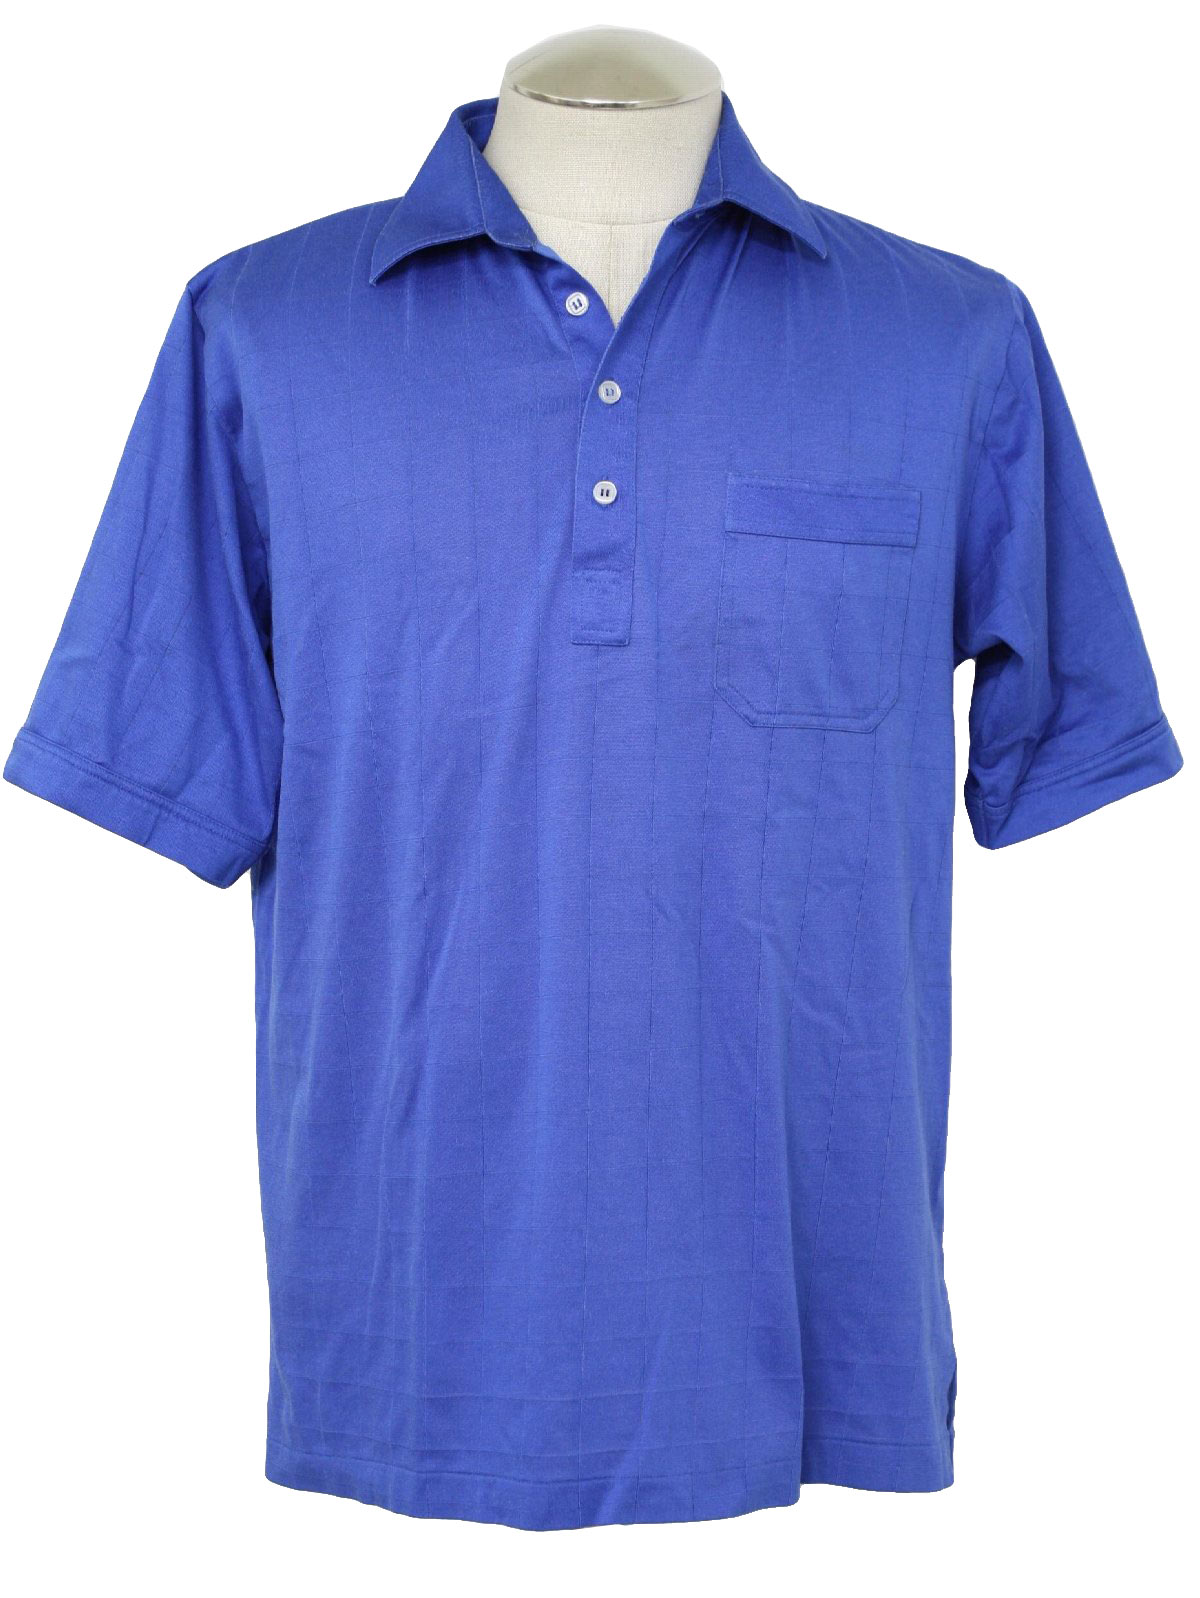 Eighties Vintage Shirt 80s Di Minzoni Mens Blue Cotton